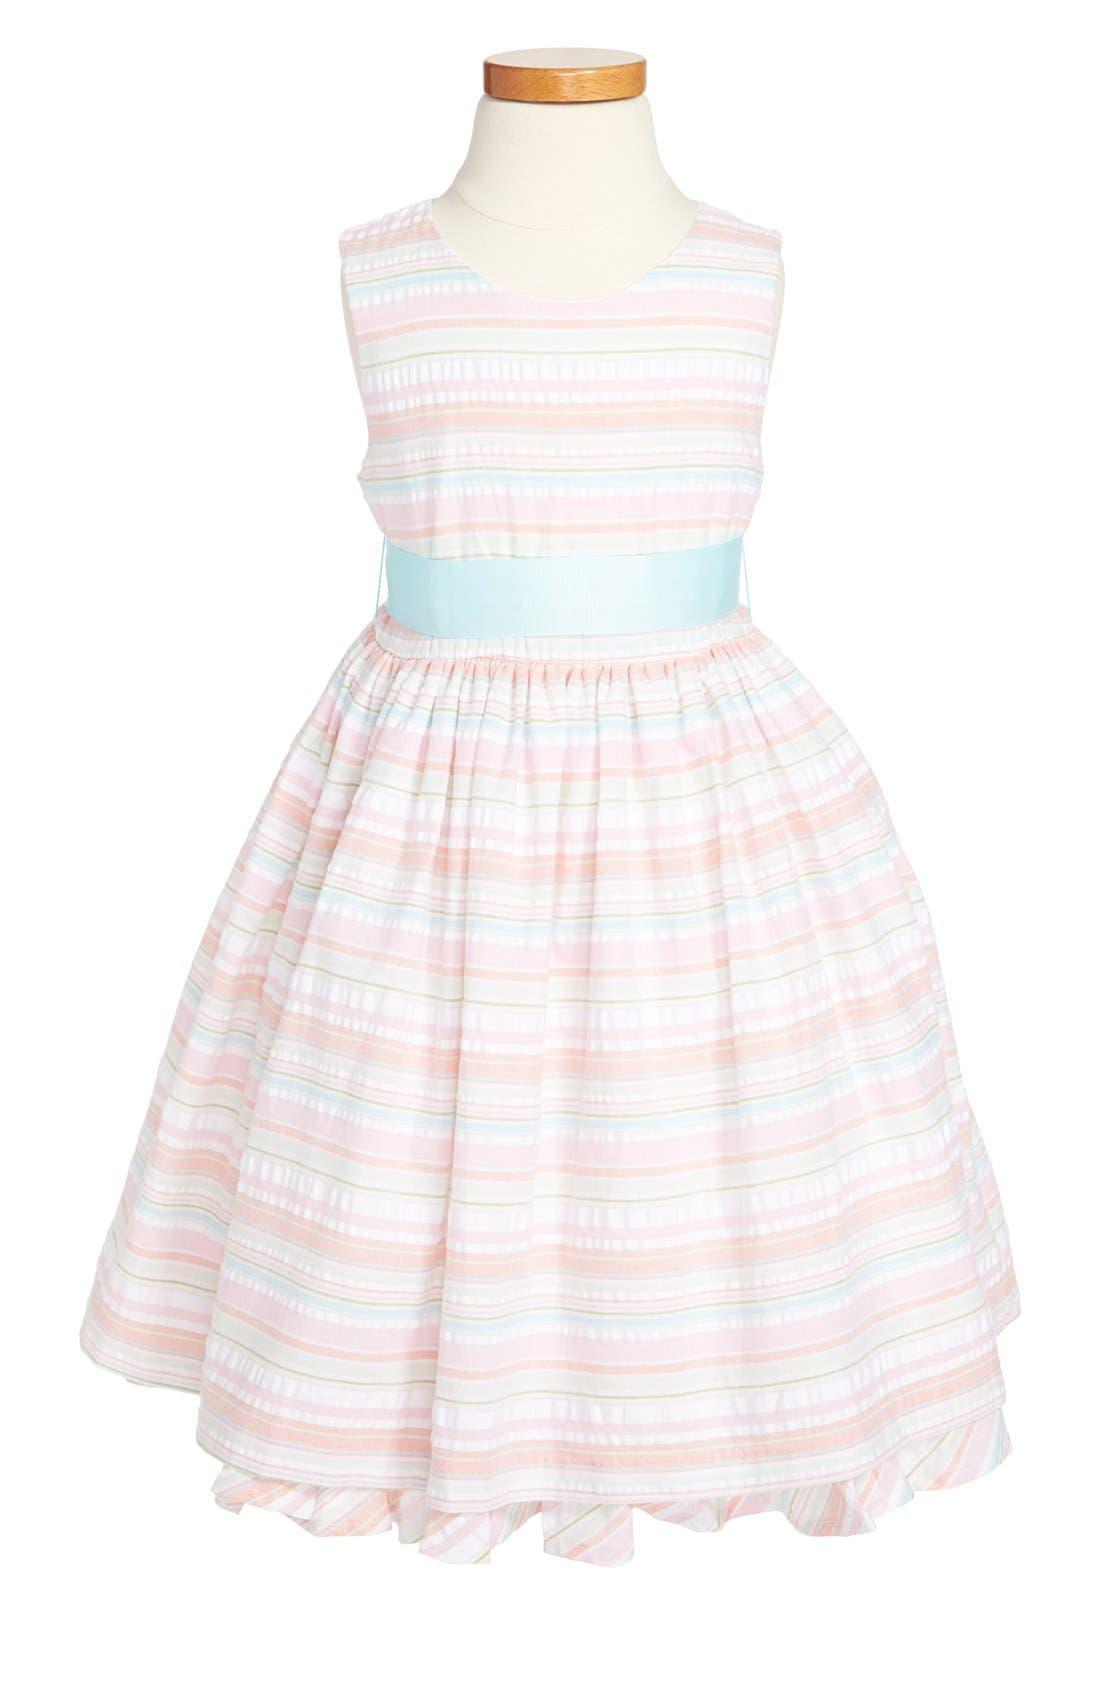 Main Image - Pippa & Julie Seersucker Stripe Cotton Dress (Little Girls & Big Girls)